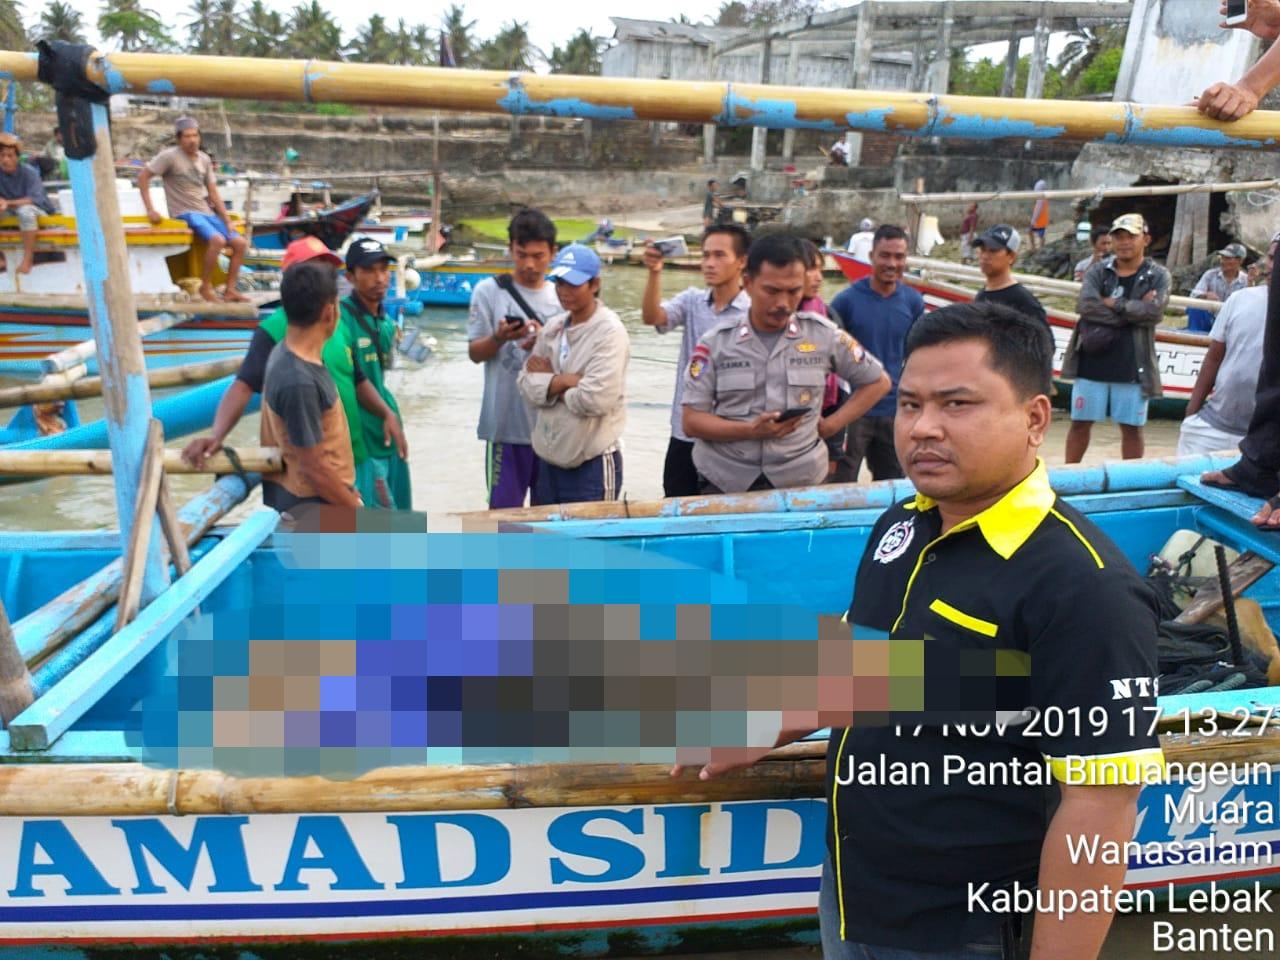 Polisi Selidiki Penemuan Mayat Tanpa Busana Di Pesisir Pantai Tenjolaya